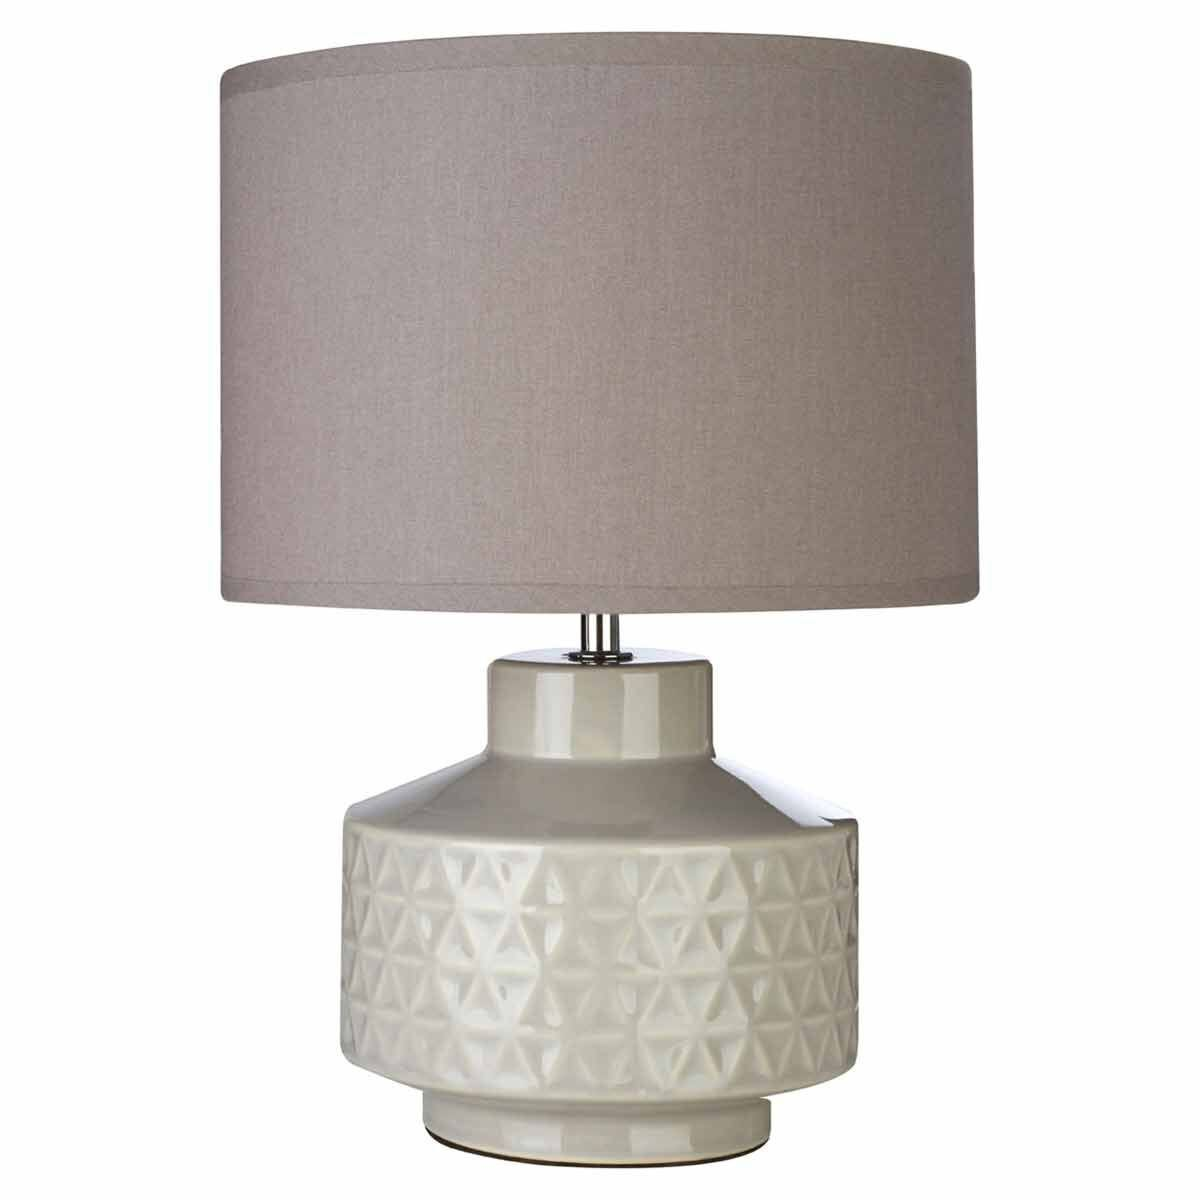 Waverly Ceramic Table Lamp